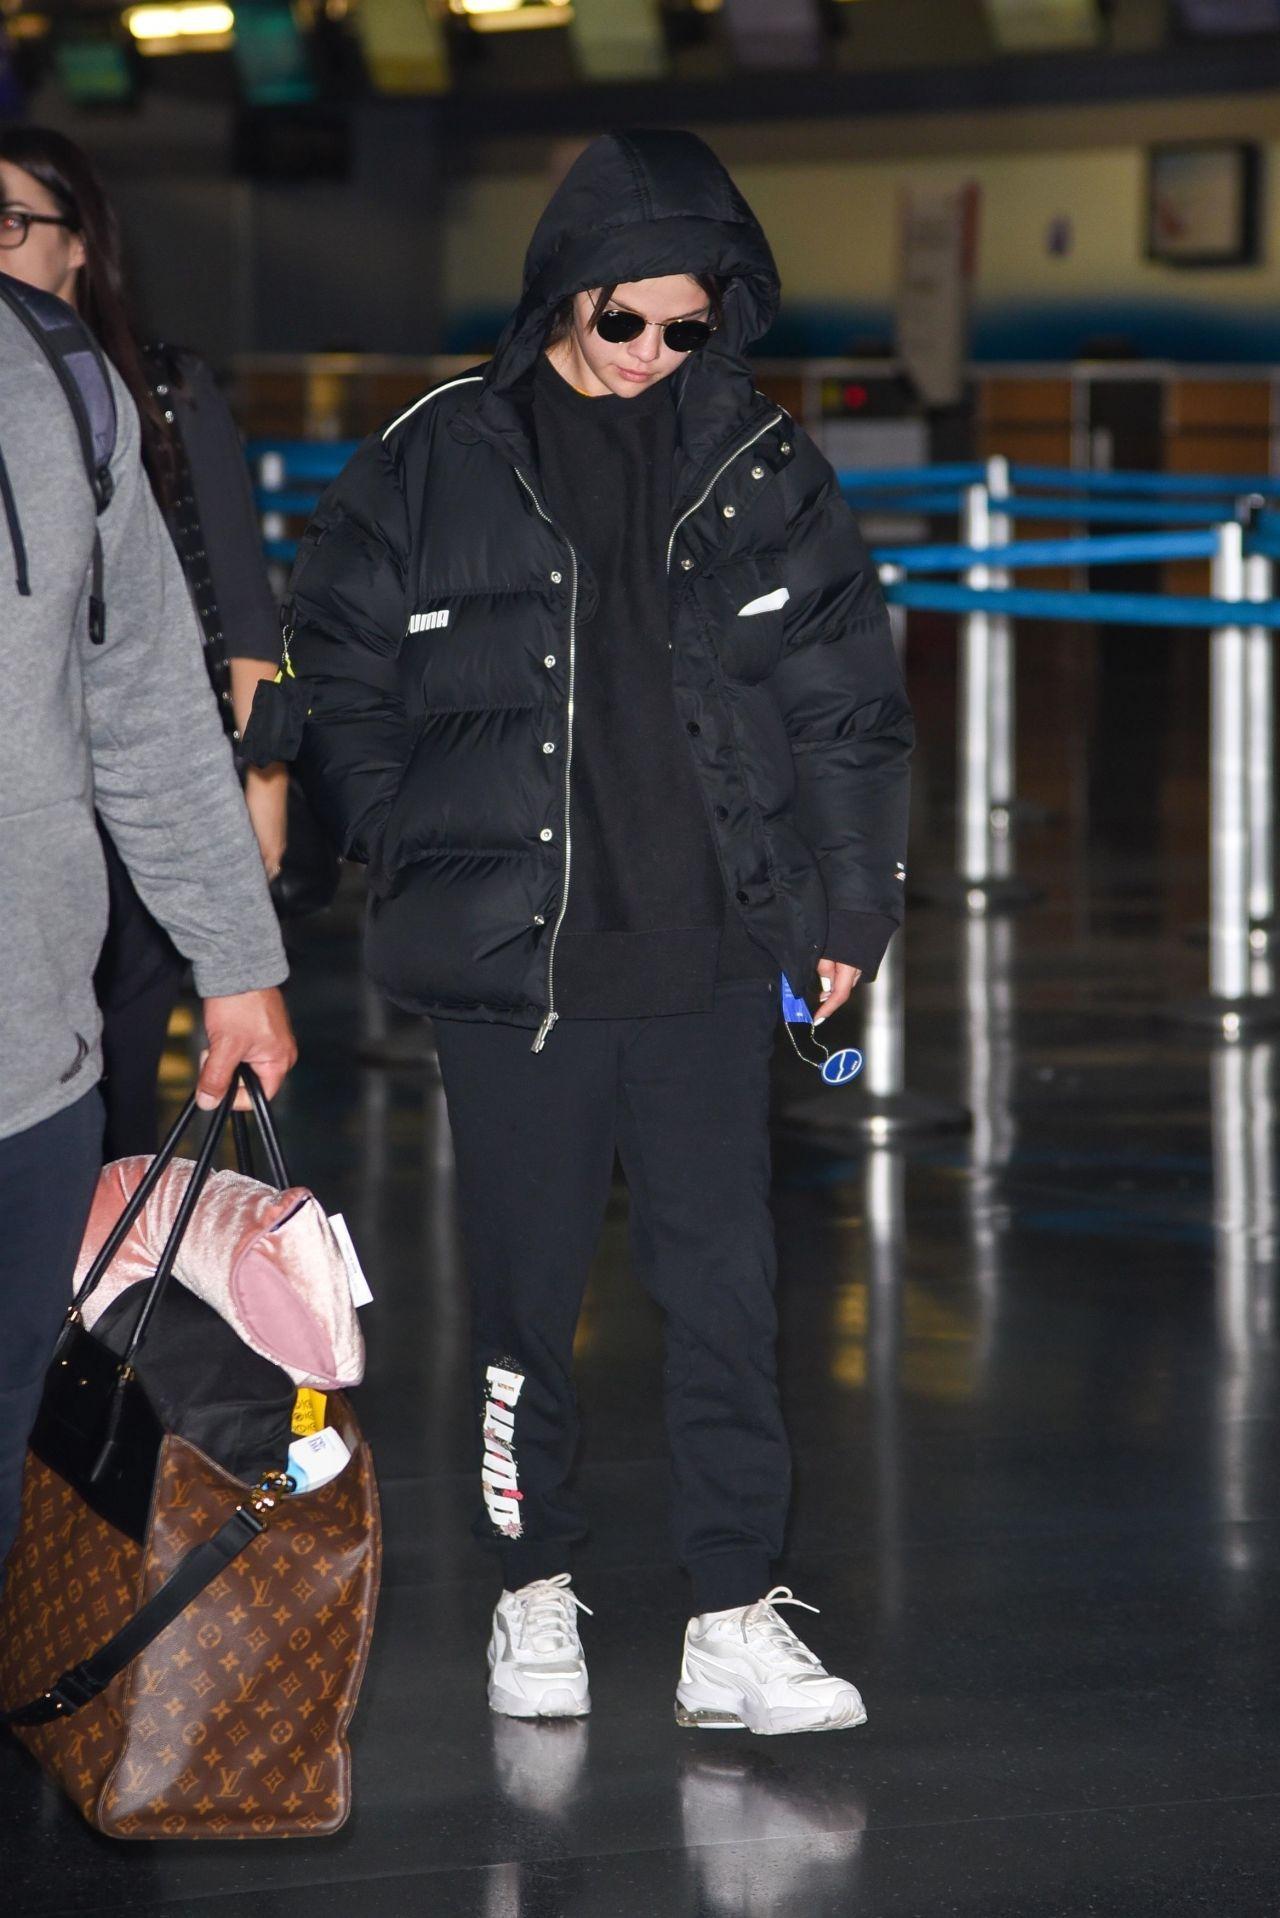 Predownload: Selena Gomez At Jfk Airport In New York 01 12 2020 Selena Gomez Outfits Selena Gomez Photos Selena Gomez Street Style [ 1918 x 1280 Pixel ]